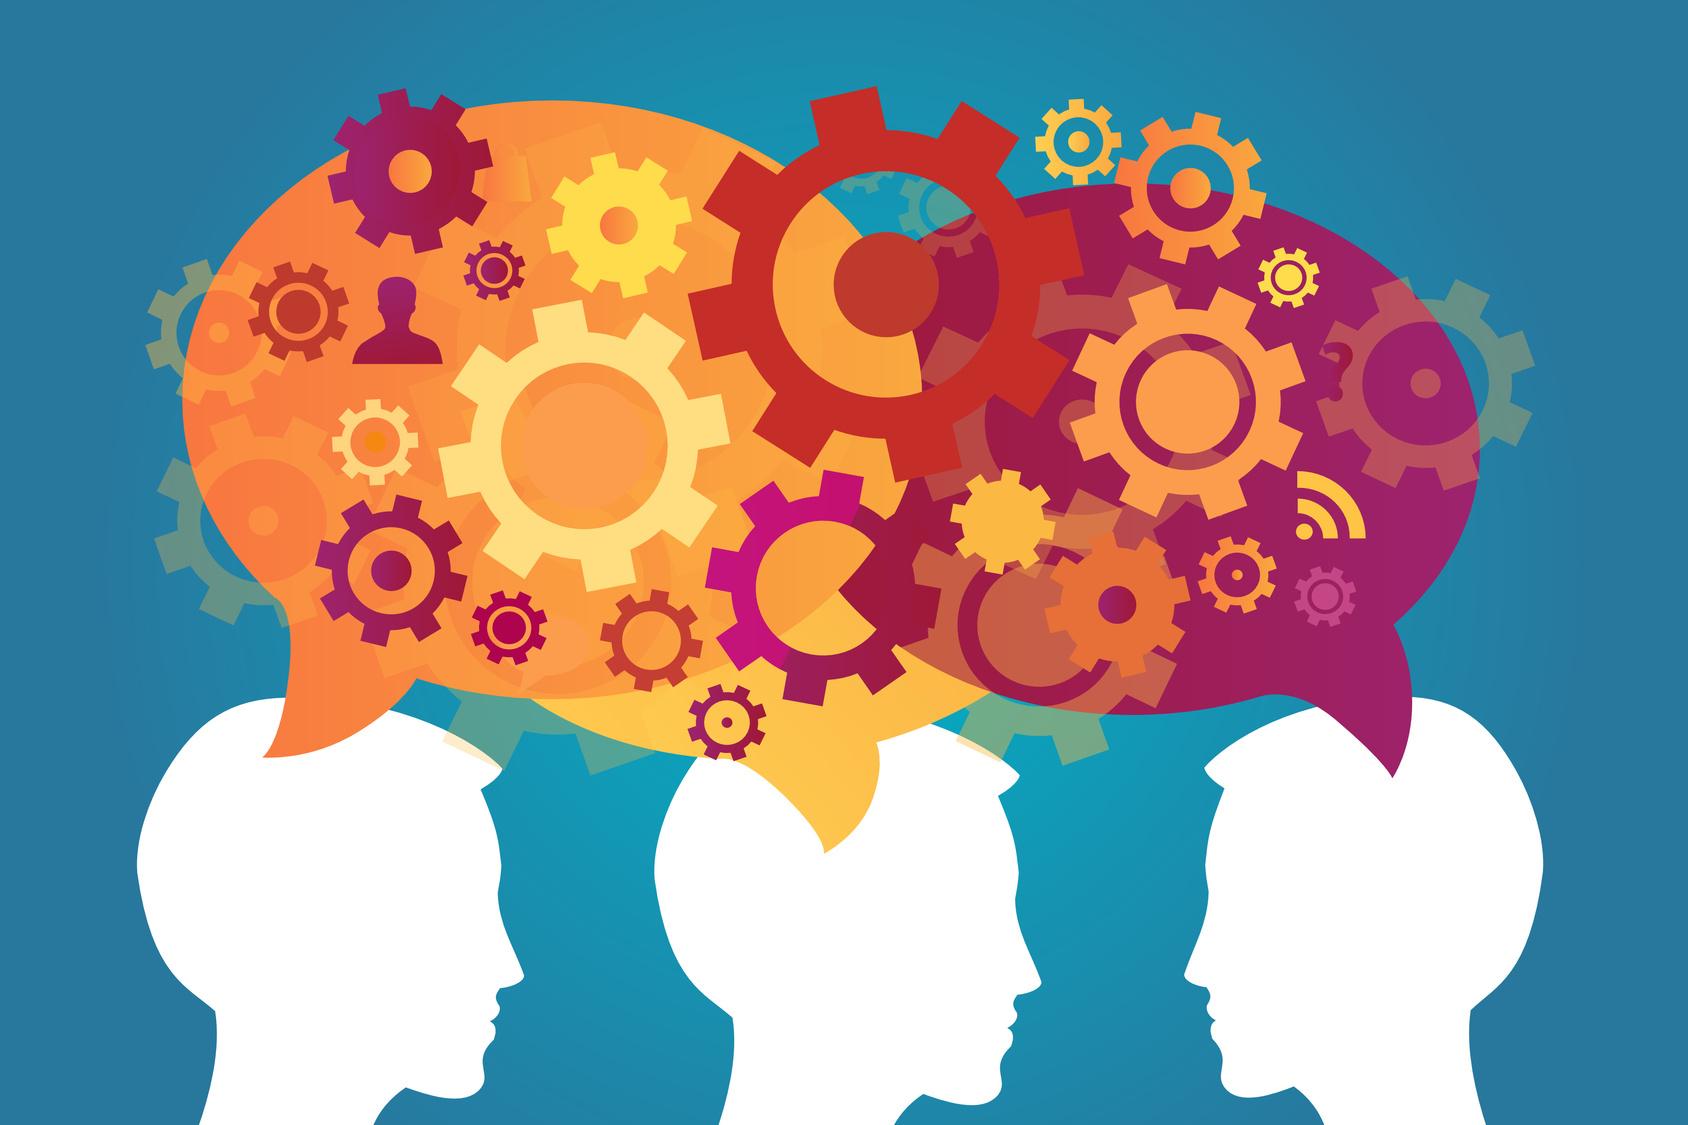 Brainstorm - research for app keywords